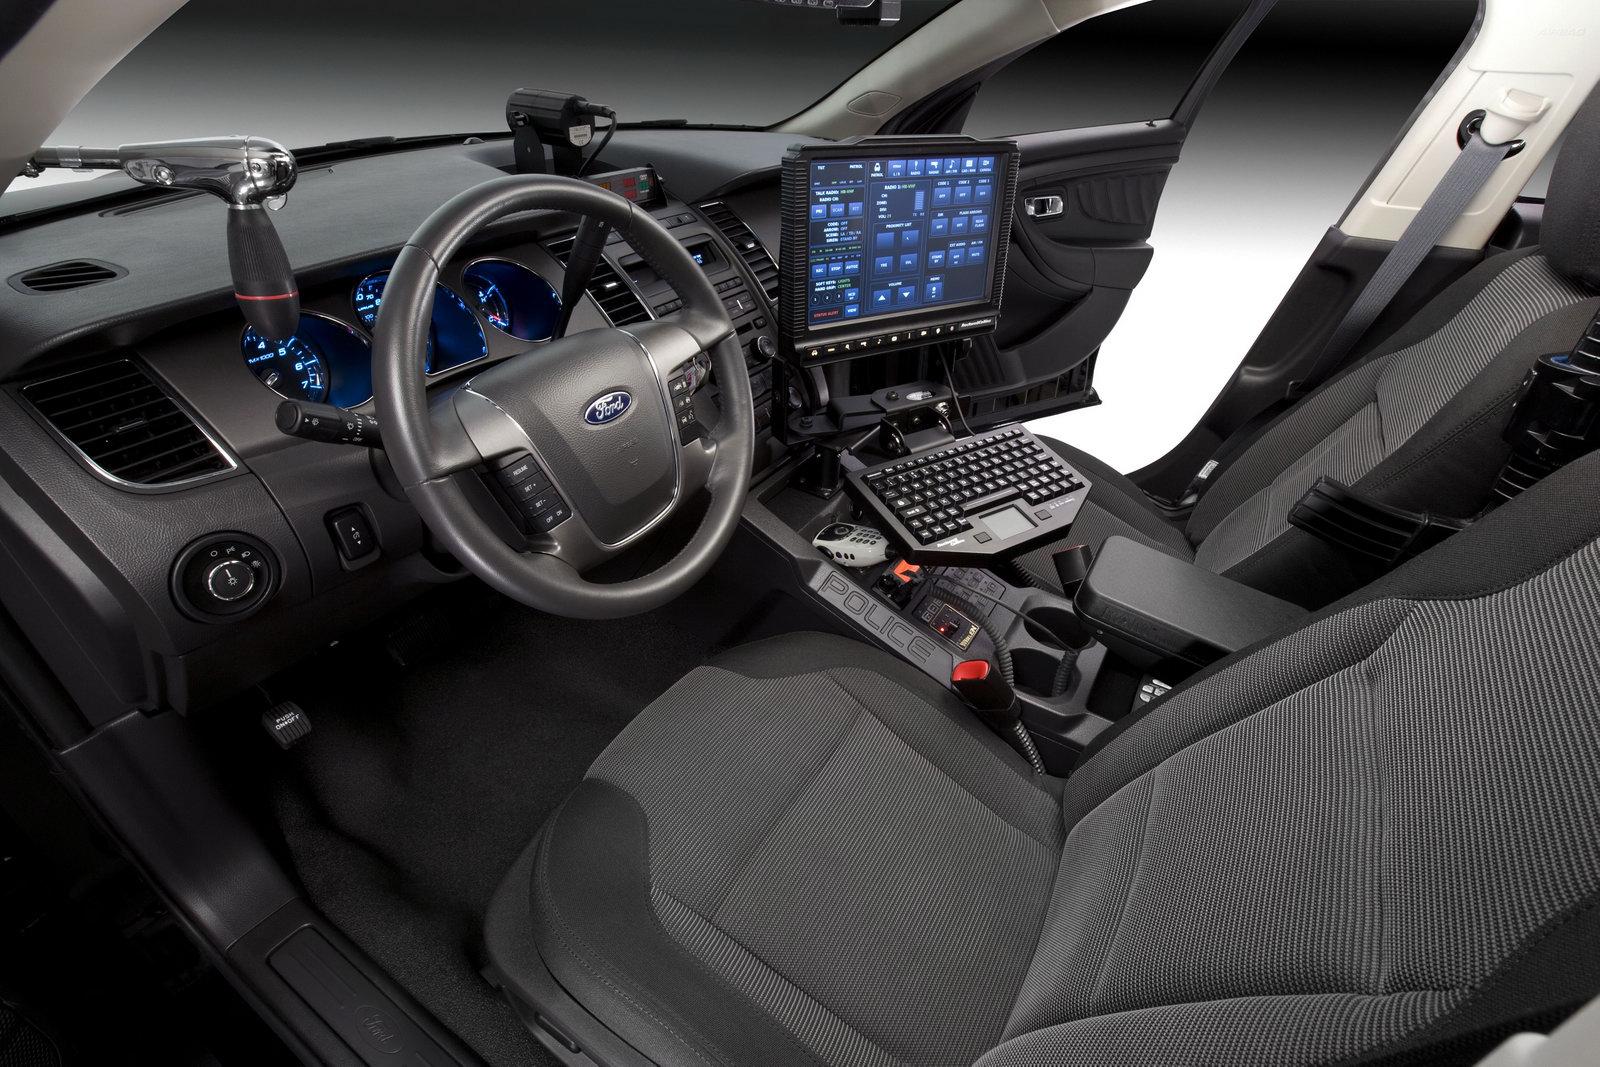 Ford-Taurus-Inteceptor-3.jpg